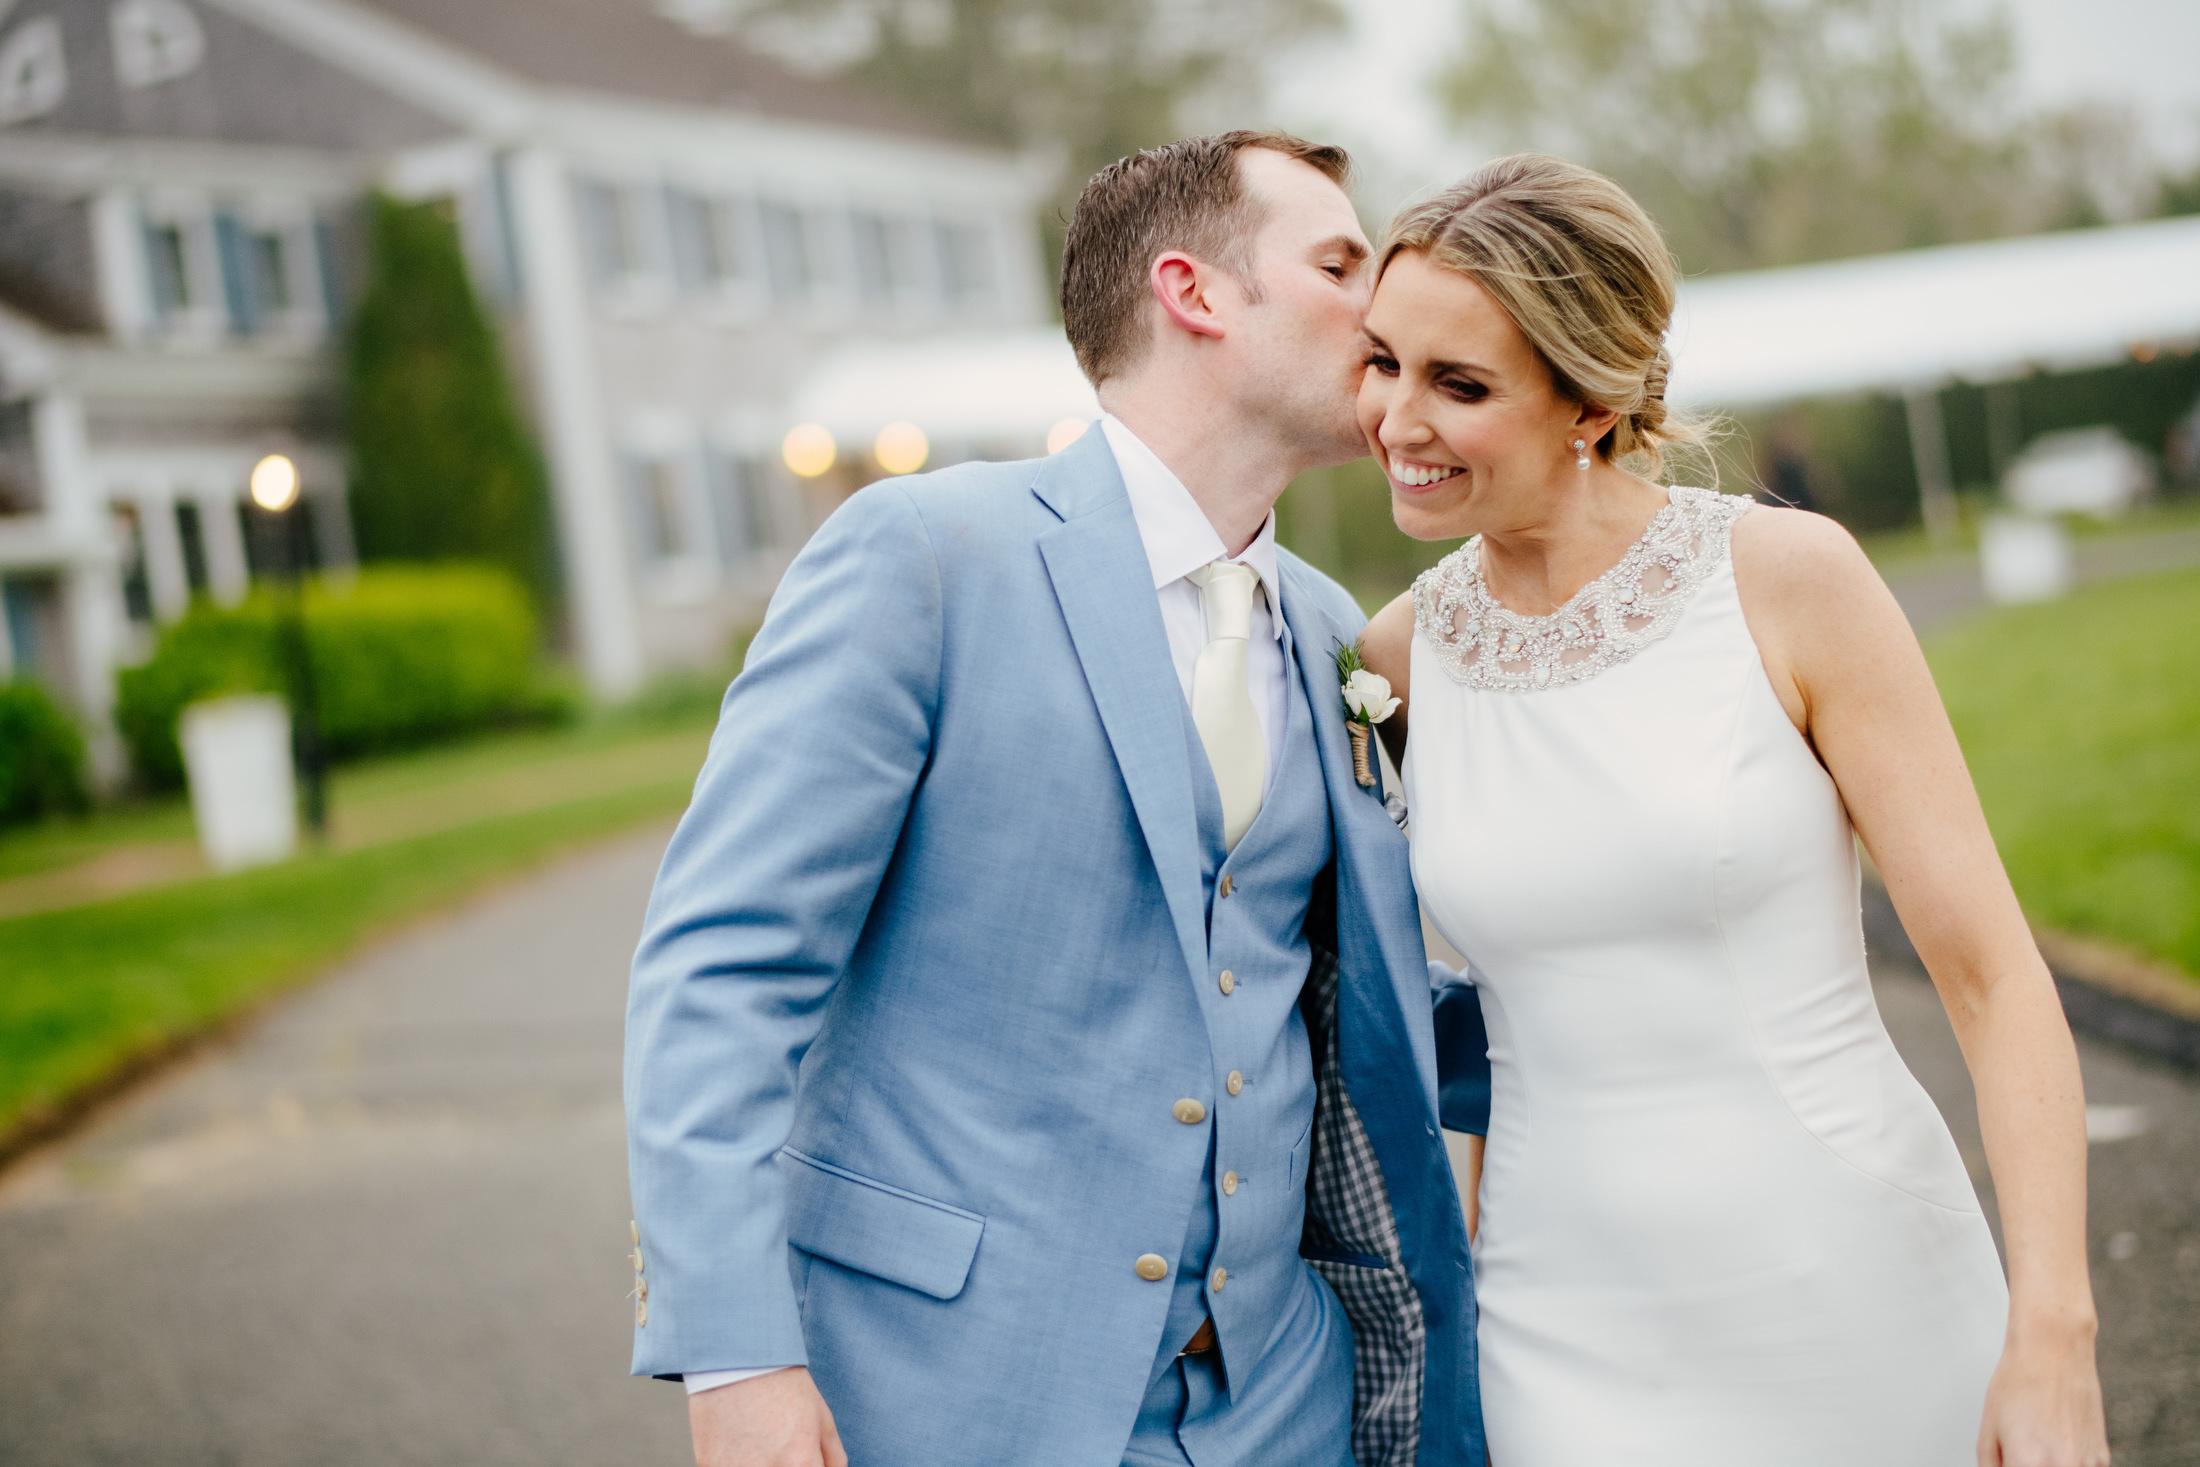 dennis_inn_wedding_mikhail_glabets_31.JPG